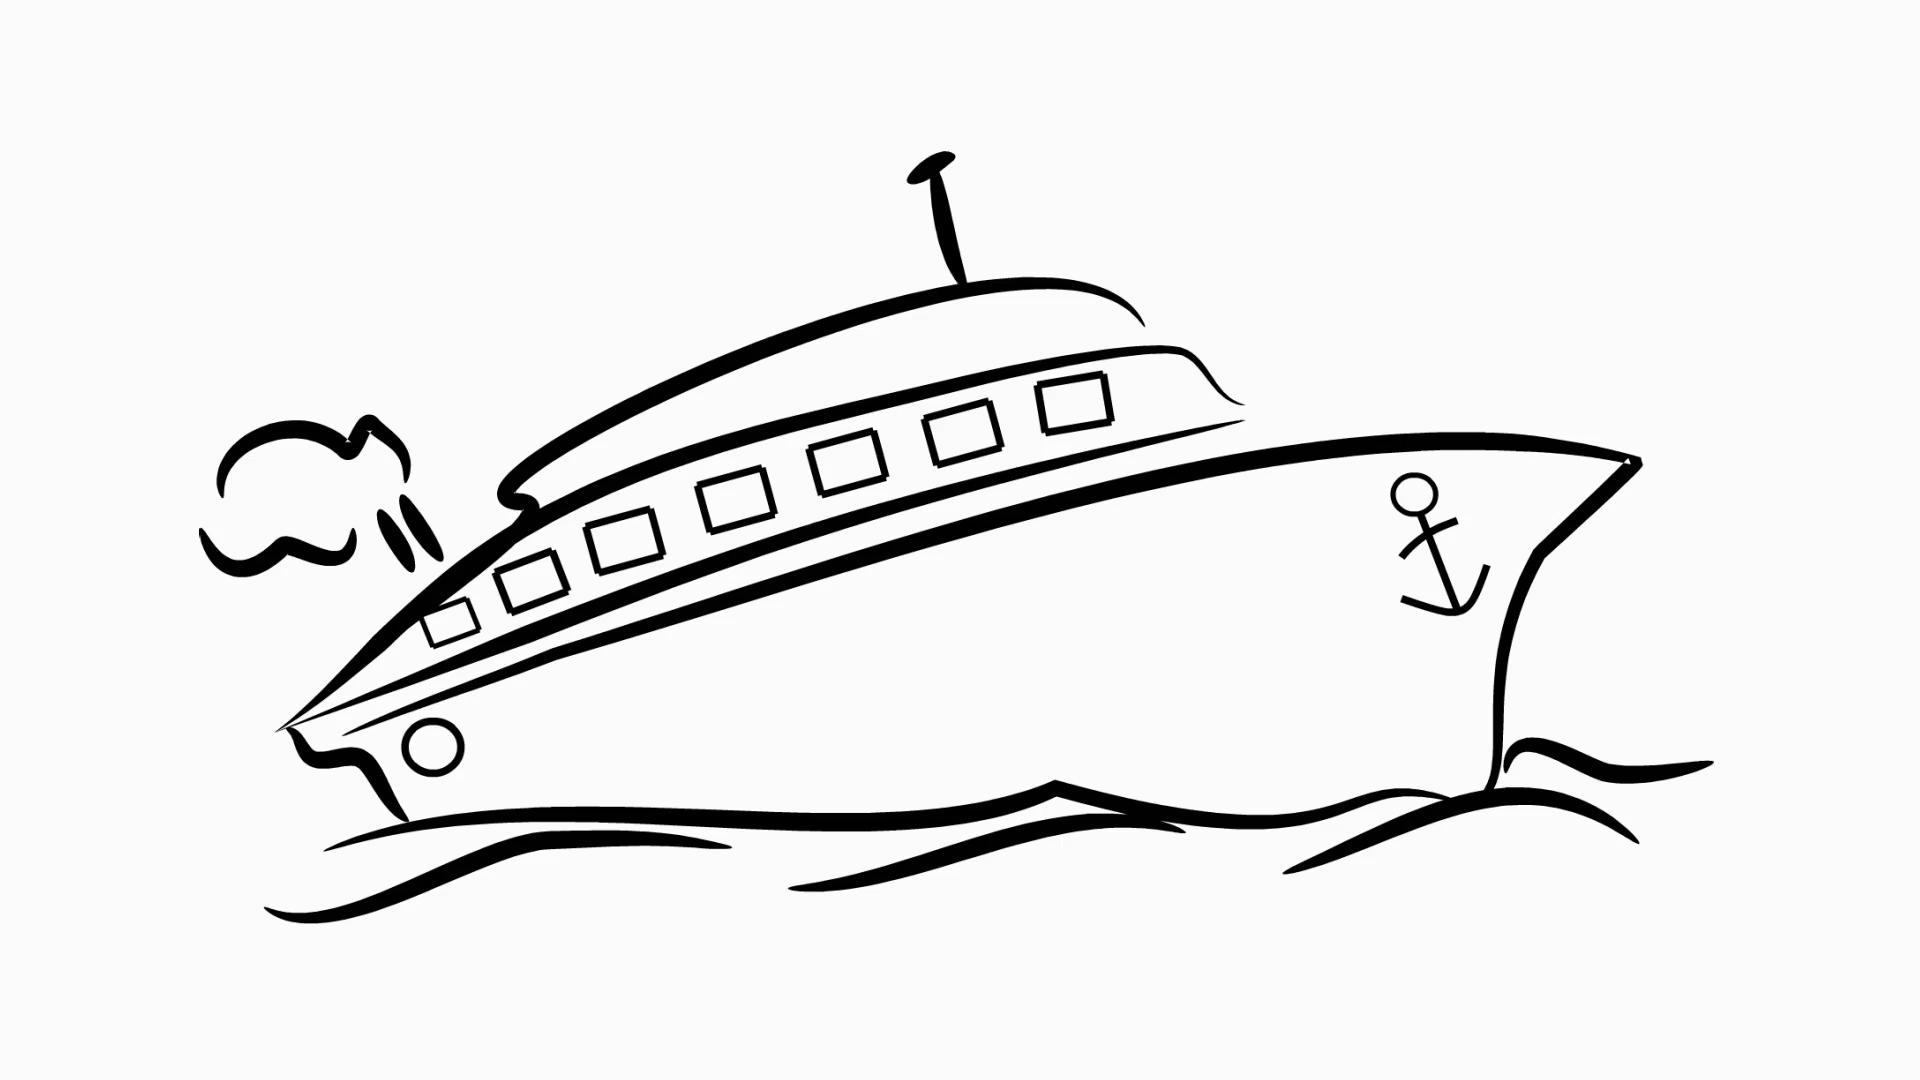 Ship transportation cargo line drawing illustration animation with  transparent background.